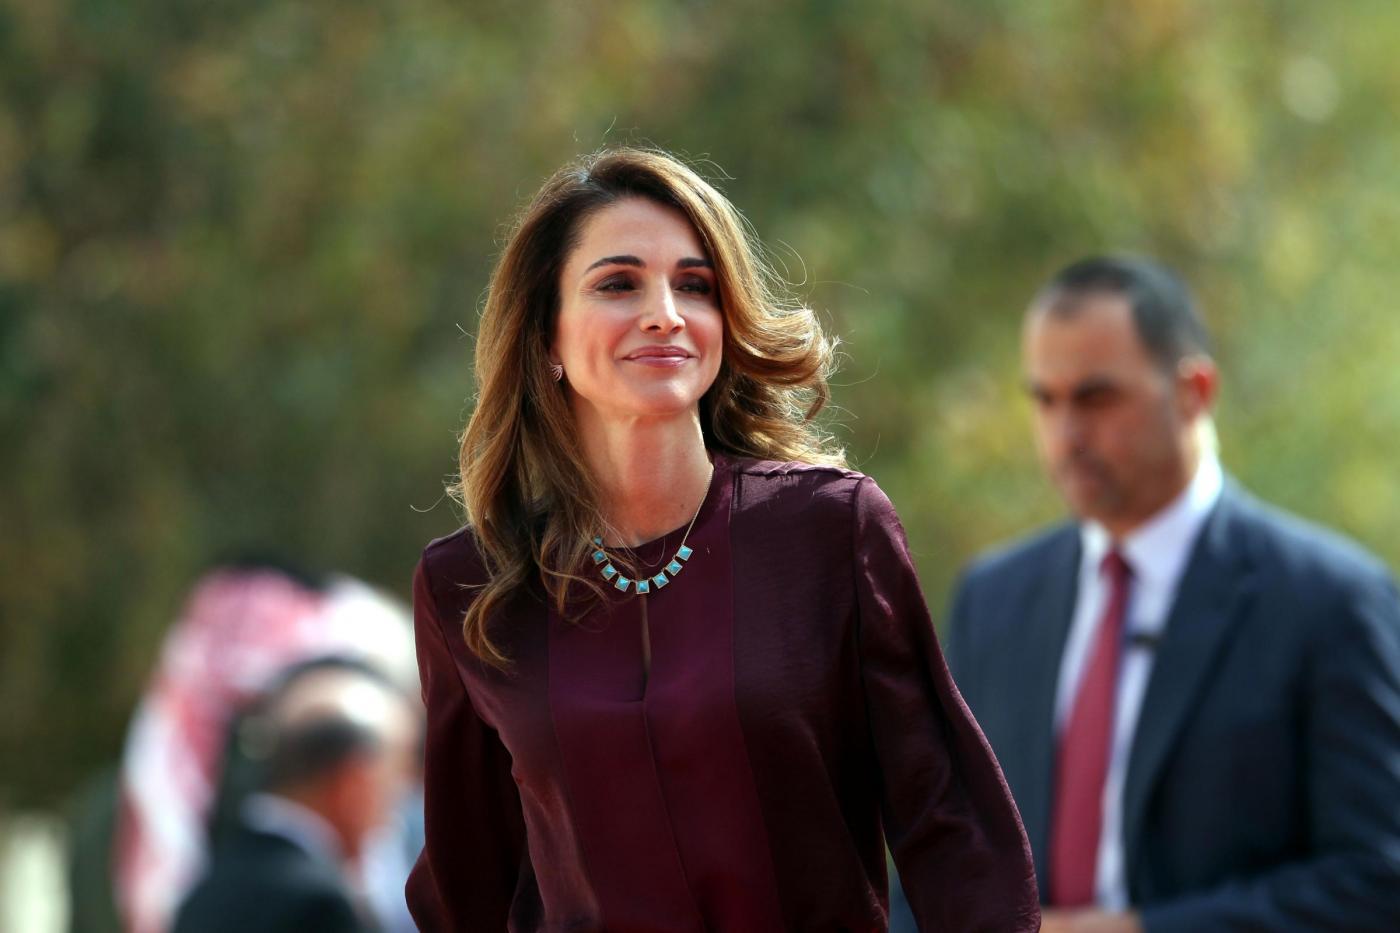 Rania di Giordania al Women in the World Summit 2015 FOTO